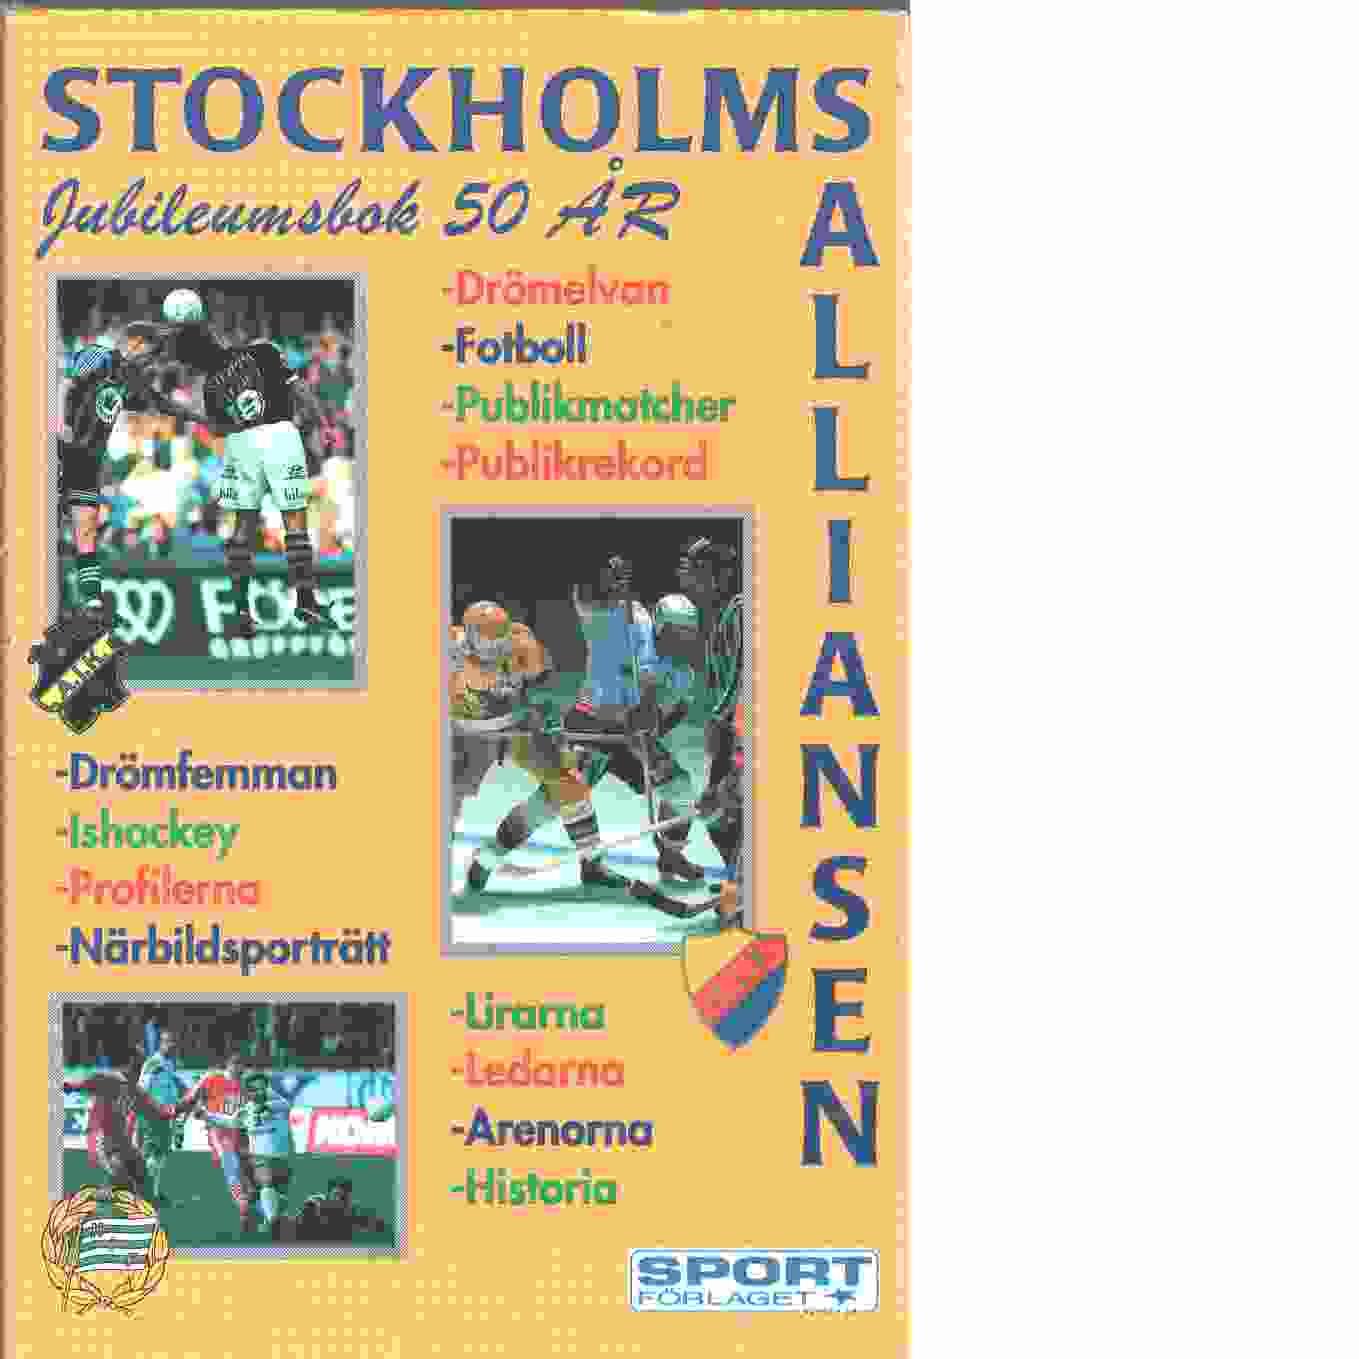 50 år med Stockholms-alliansen : [jubileumsbok] - Red.